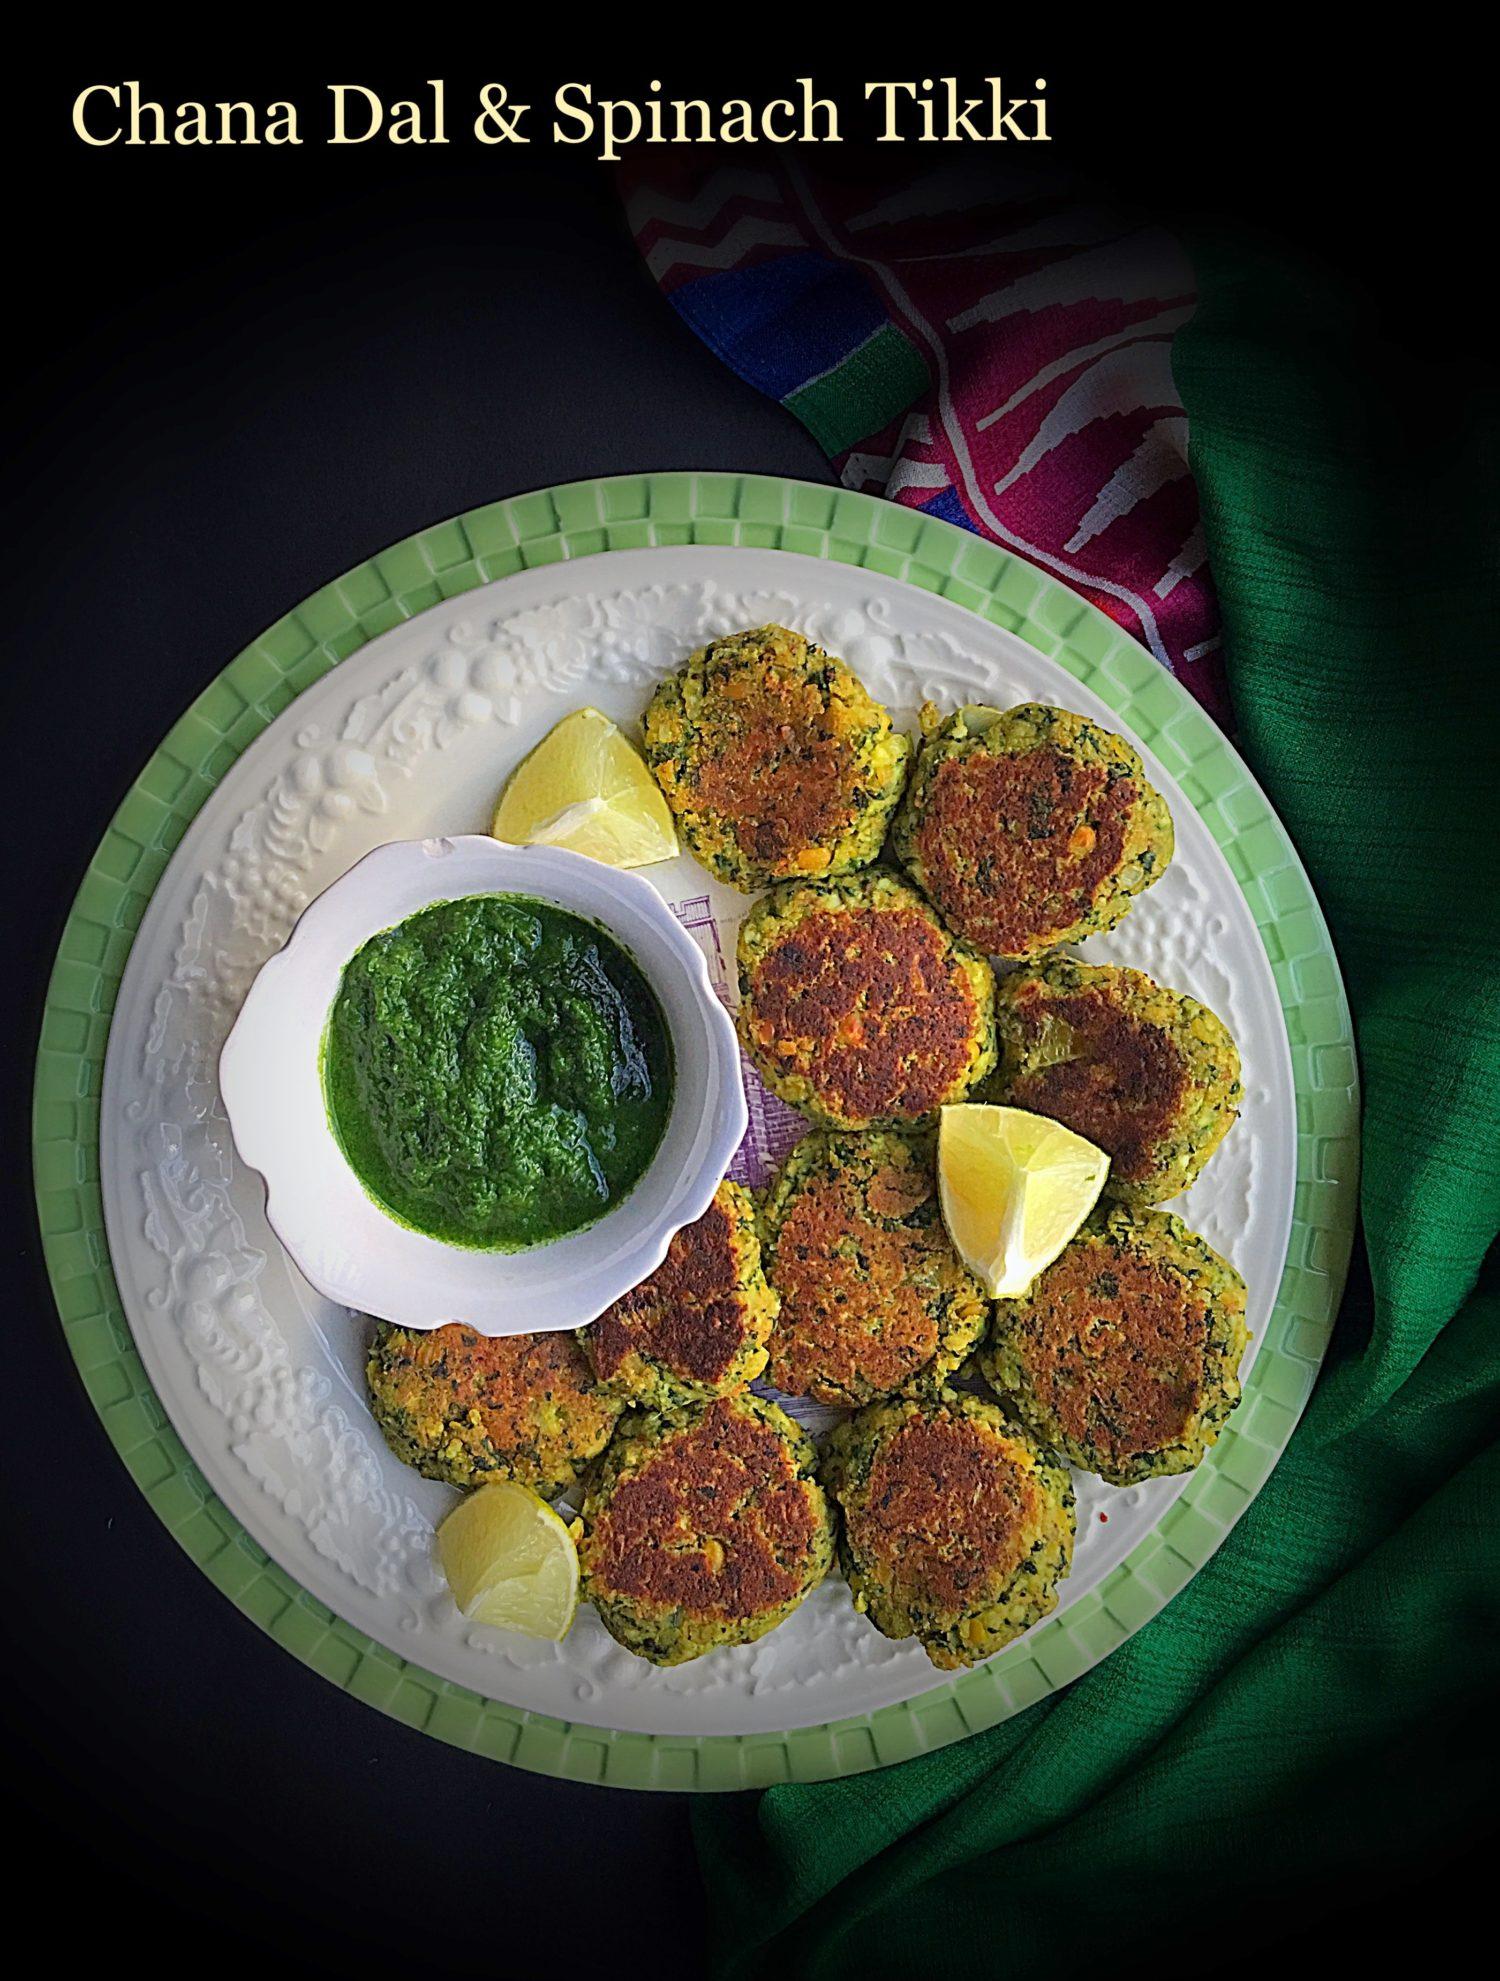 Chana Dal and Spinach Tikki